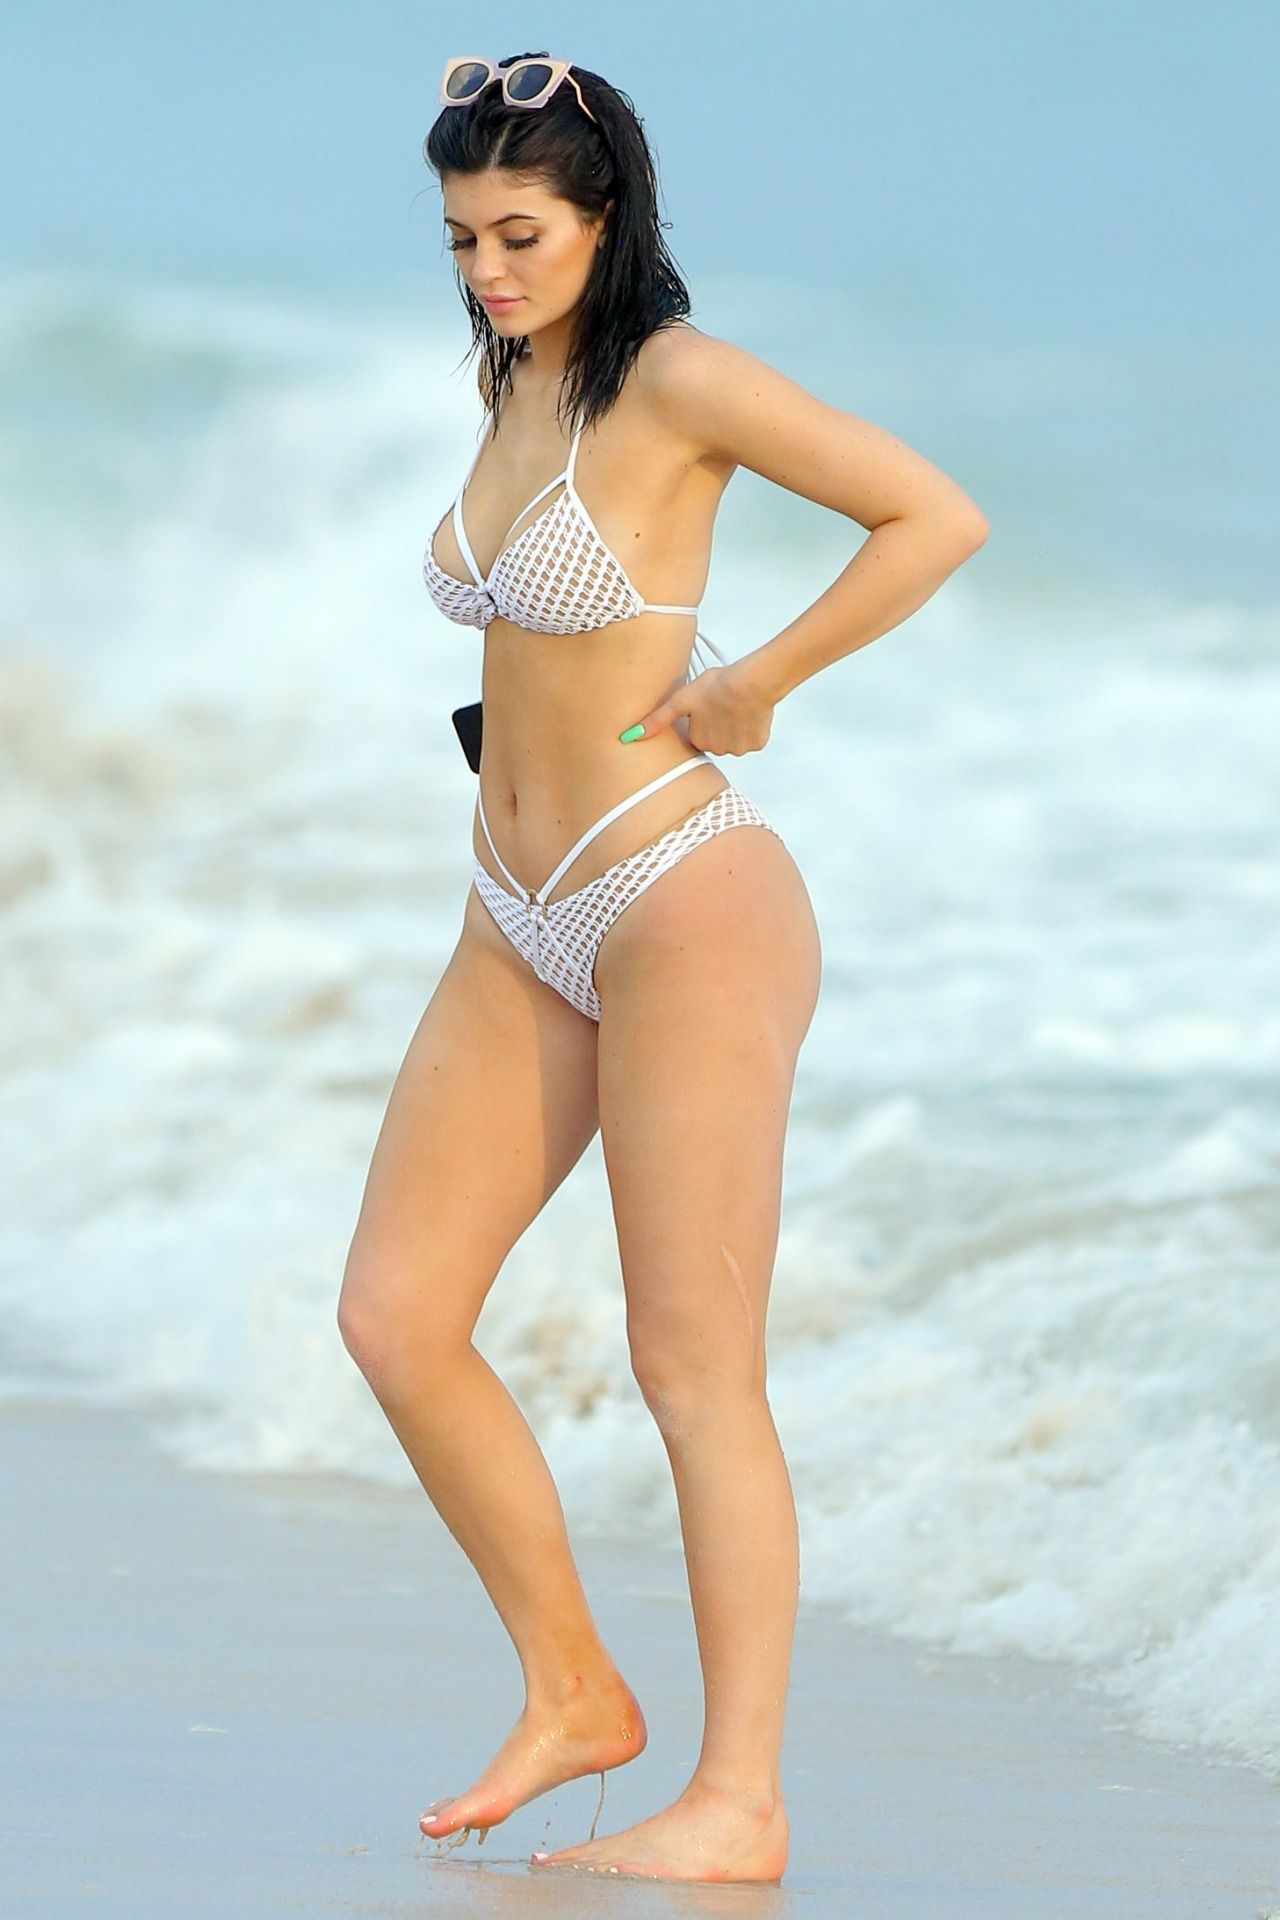 b0d2de4d2d Kylie Jenner at the beach in Mexico (Aug. 12)